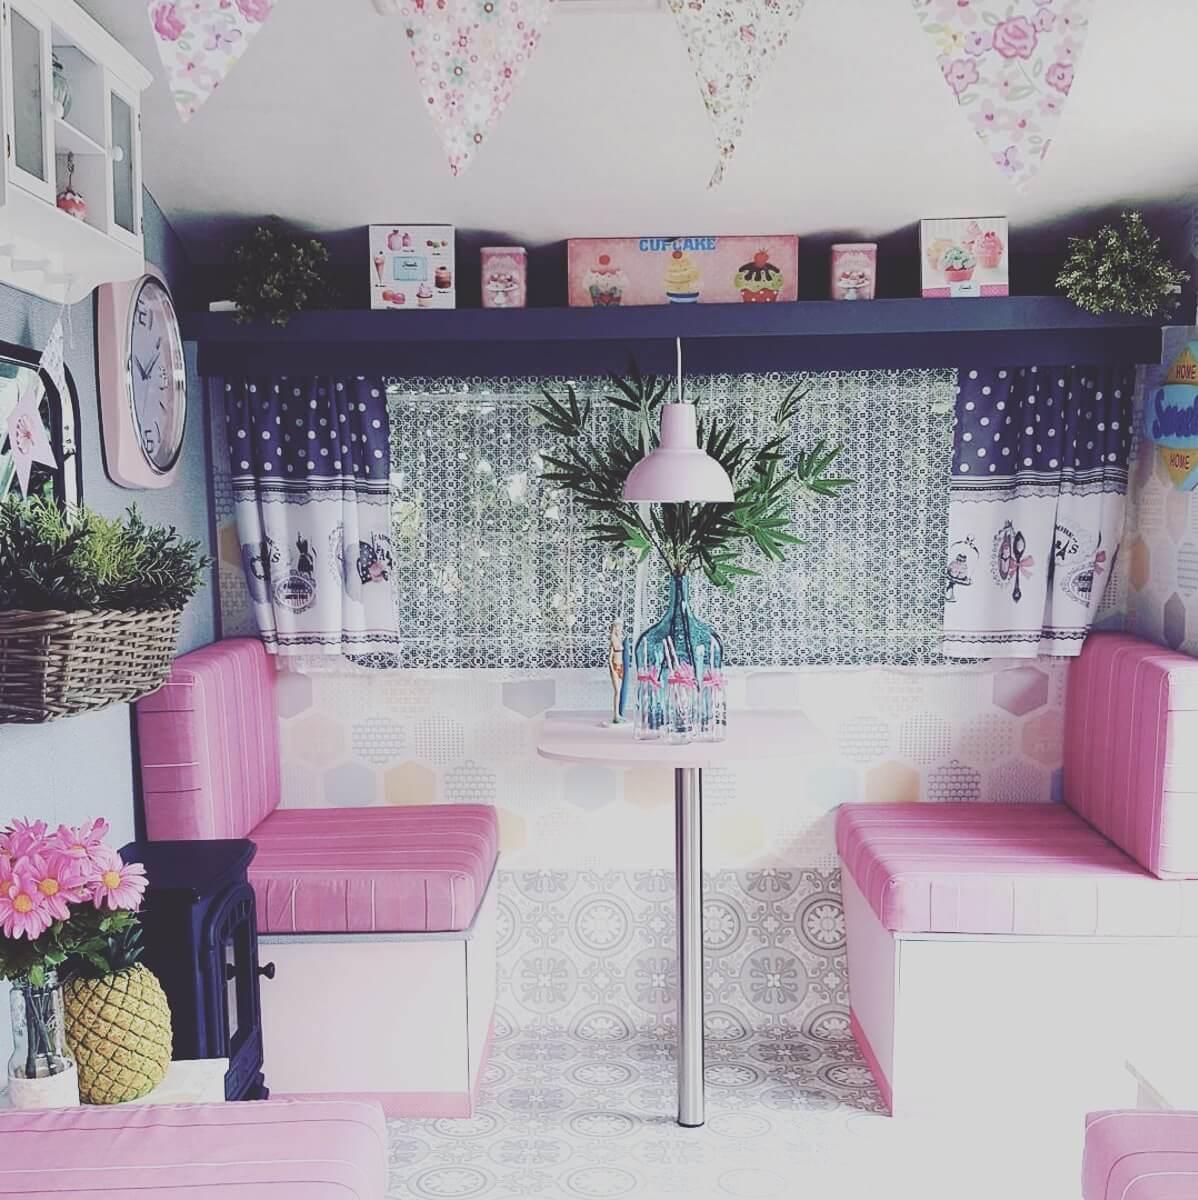 deco caravane art galerie zeuxis appartement deco. Black Bedroom Furniture Sets. Home Design Ideas